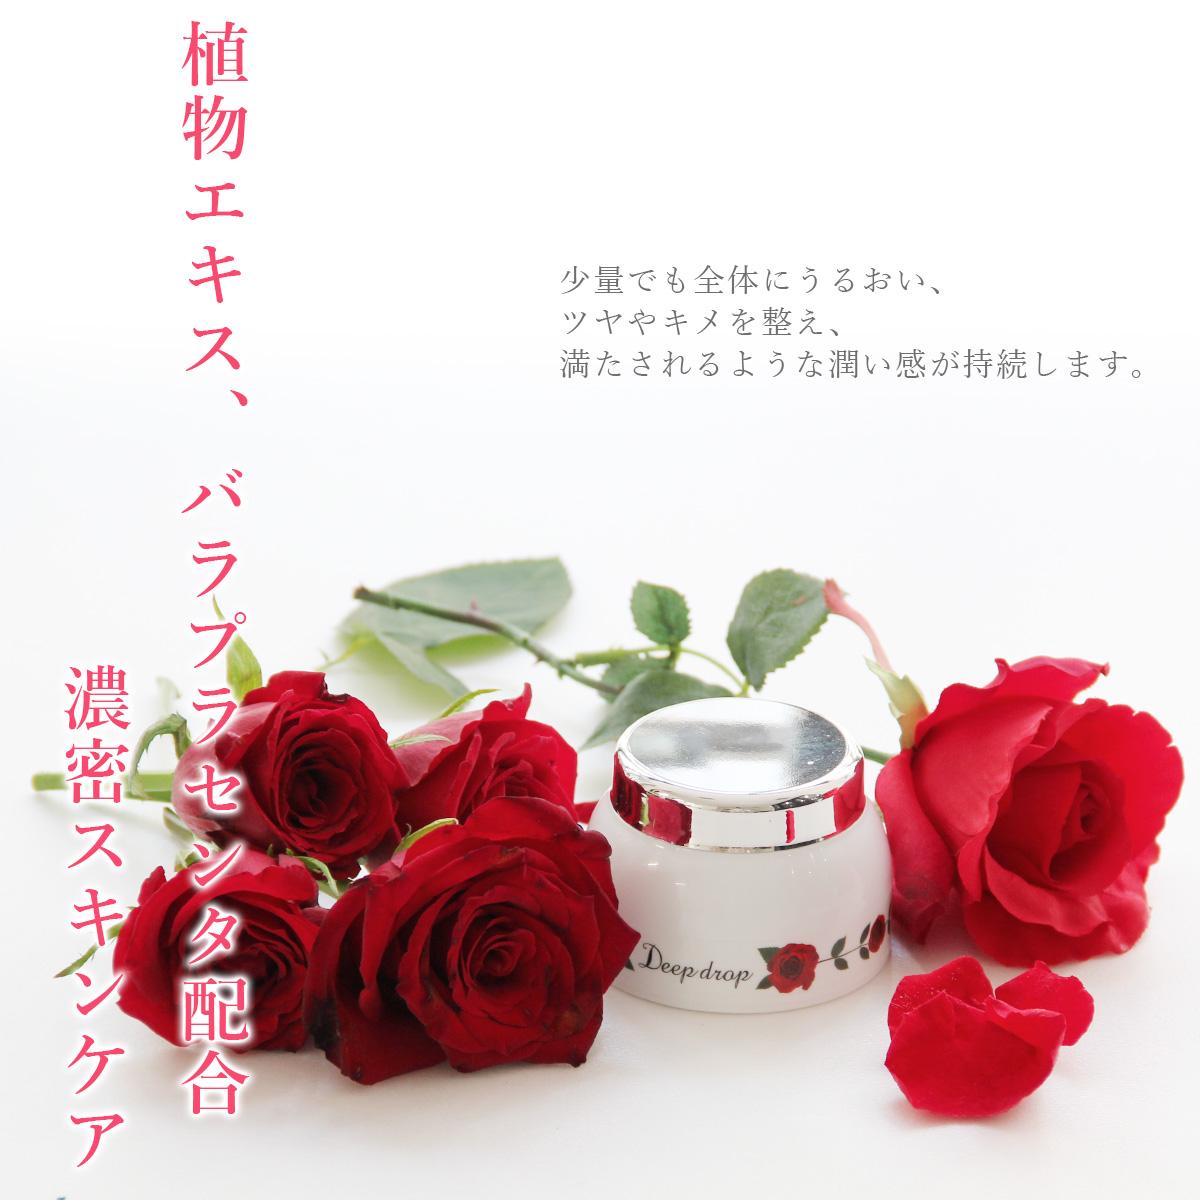 CHIECO DeepDrop クリーム(スキンケアクリーム)